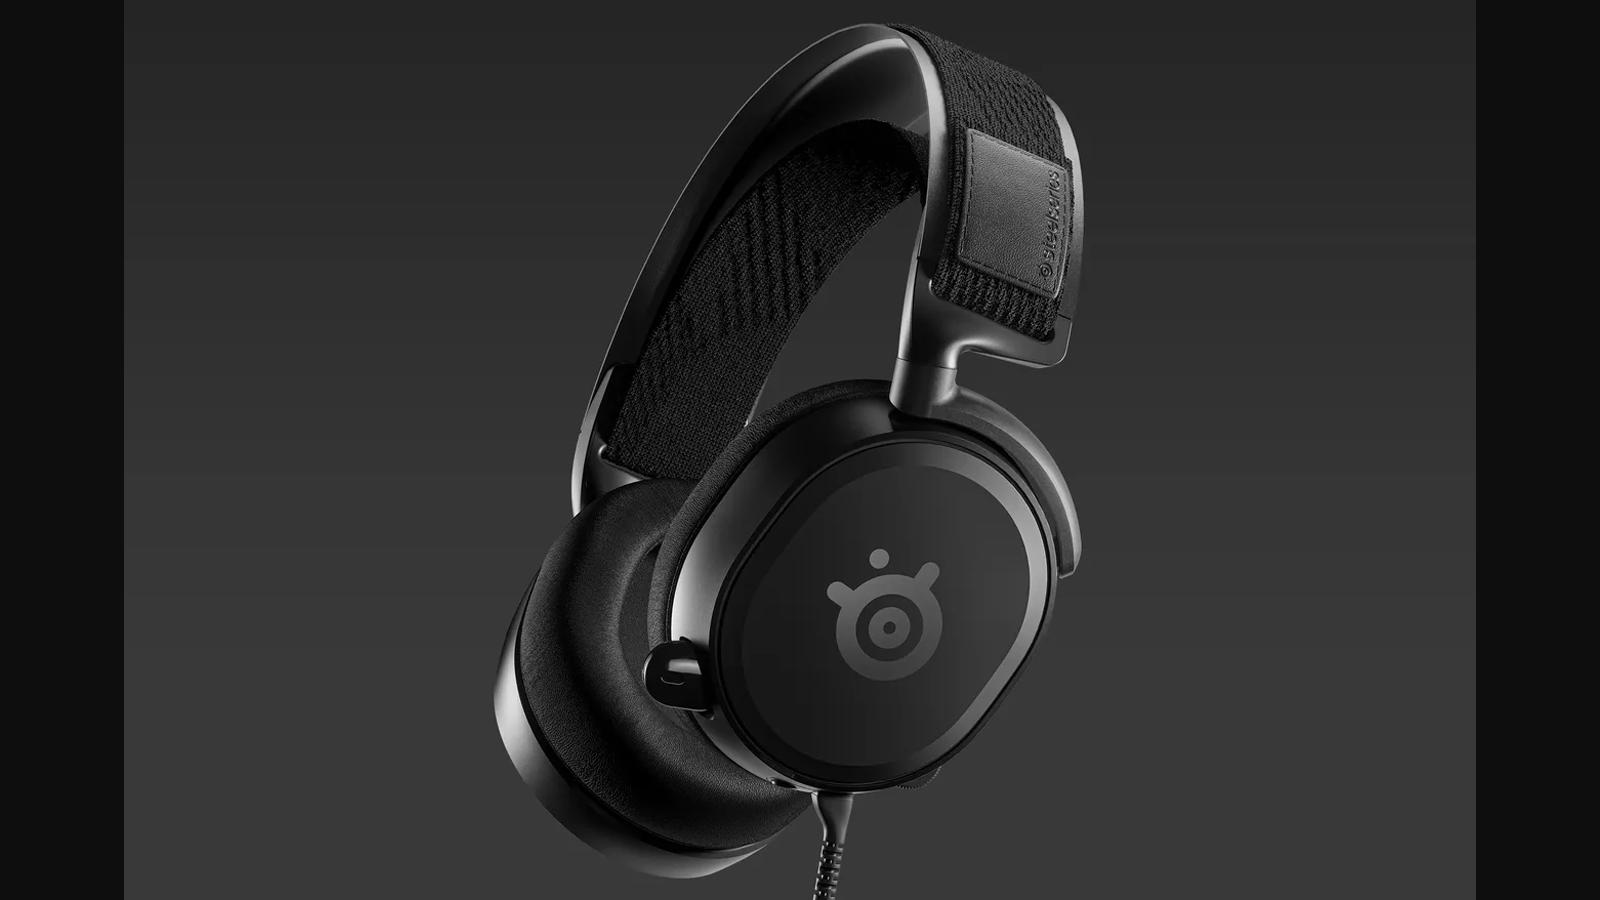 SteelSeries' new Arctis Prime gaming headset